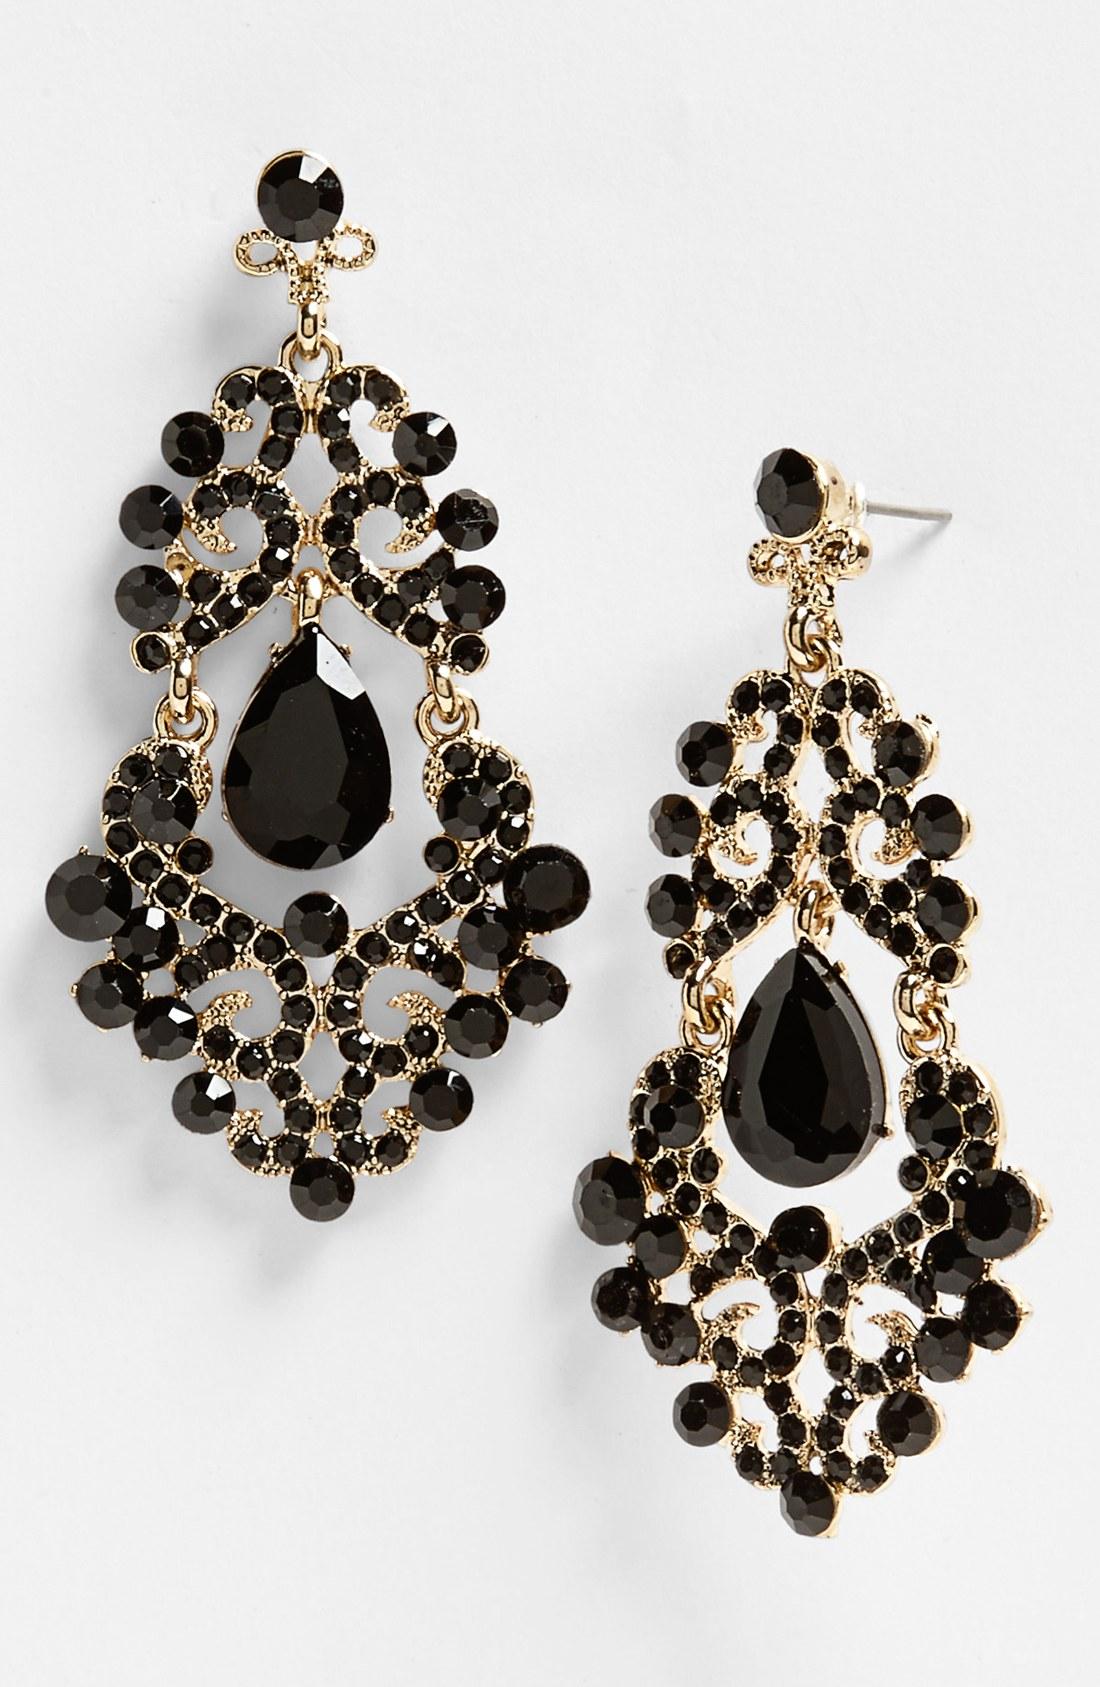 Black Gold Earrings  Black Gold. Peridot Earrings. Donation Bracelet. Brown Engagement Rings. Necktie Necklace. Autism Bracelet. Beautiful Bangles. 1ct Diamond Necklace. Ball Diamond